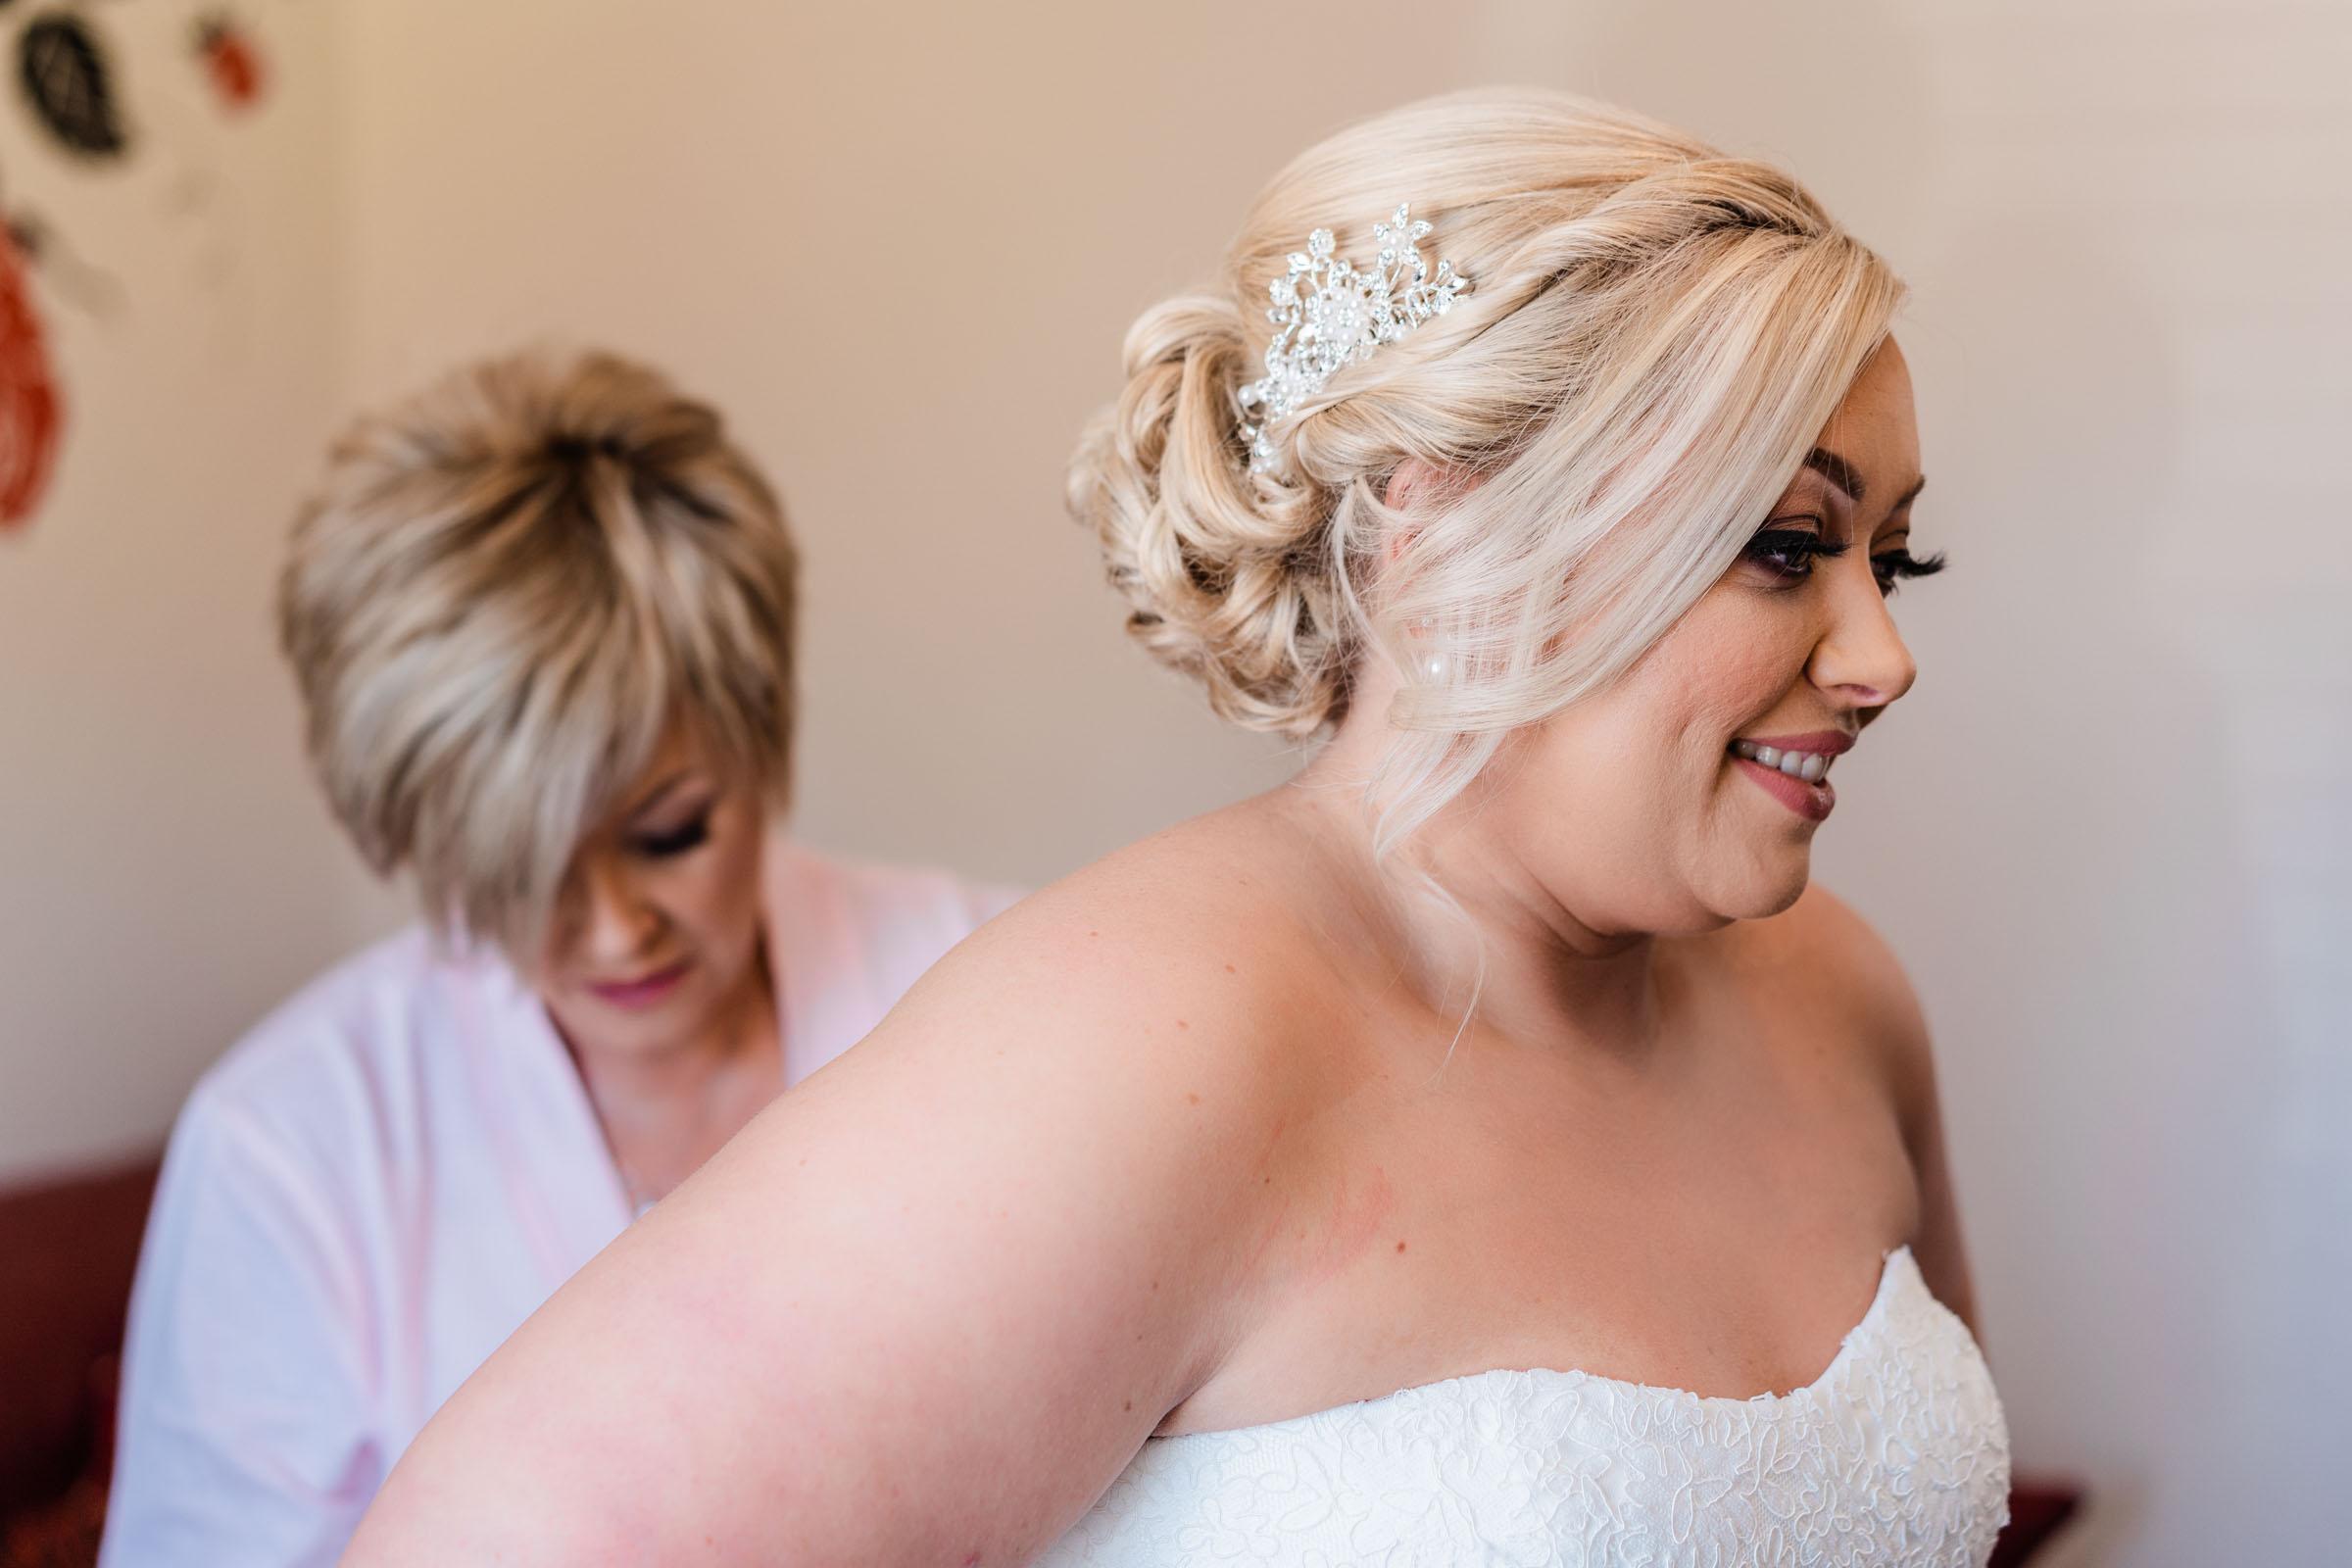 motherwell-moorings-wedding-photographer-dearlyphotography (16 of 77).jpg